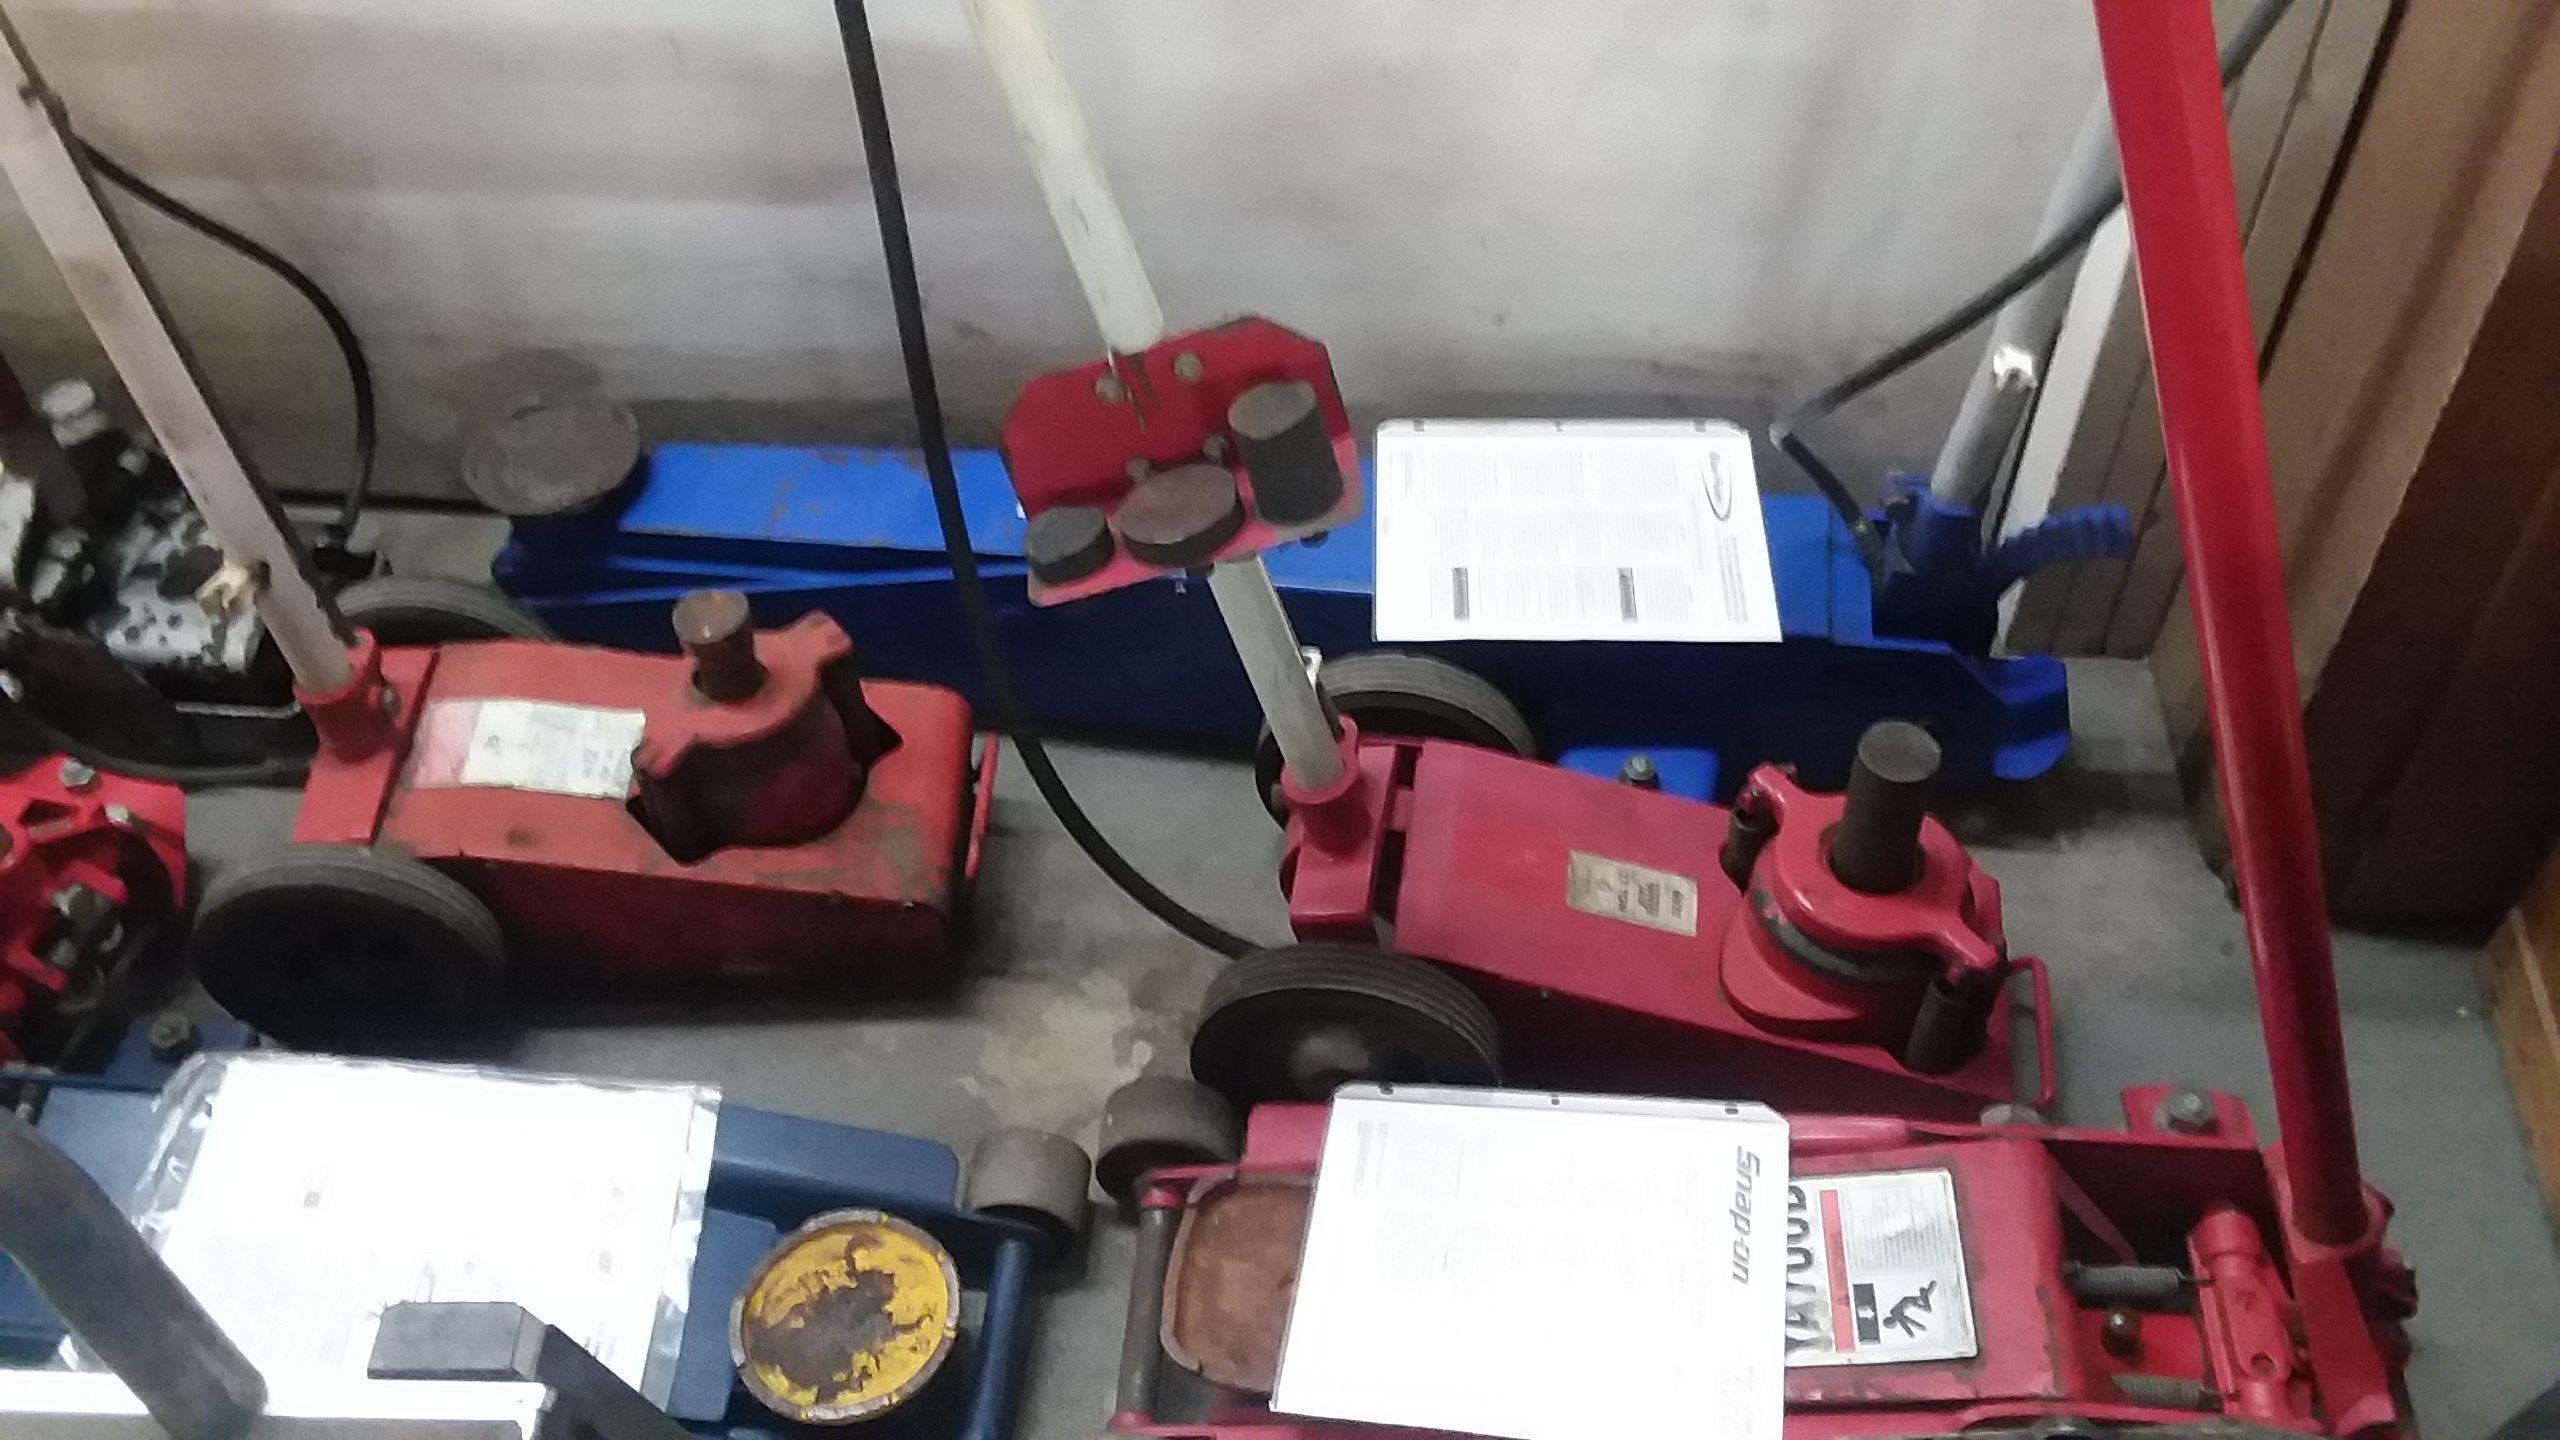 Item 6 in AUCTION: Tools & Equipment gallery